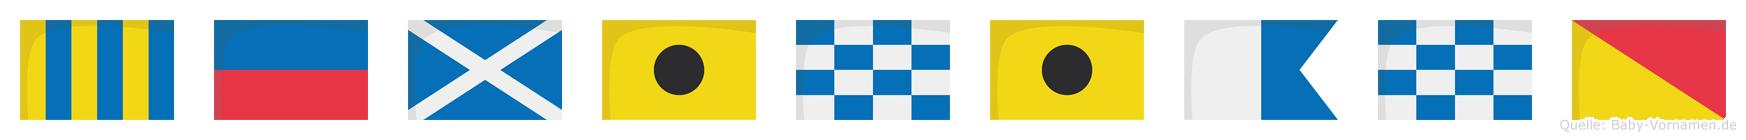 Geminiano im Flaggenalphabet